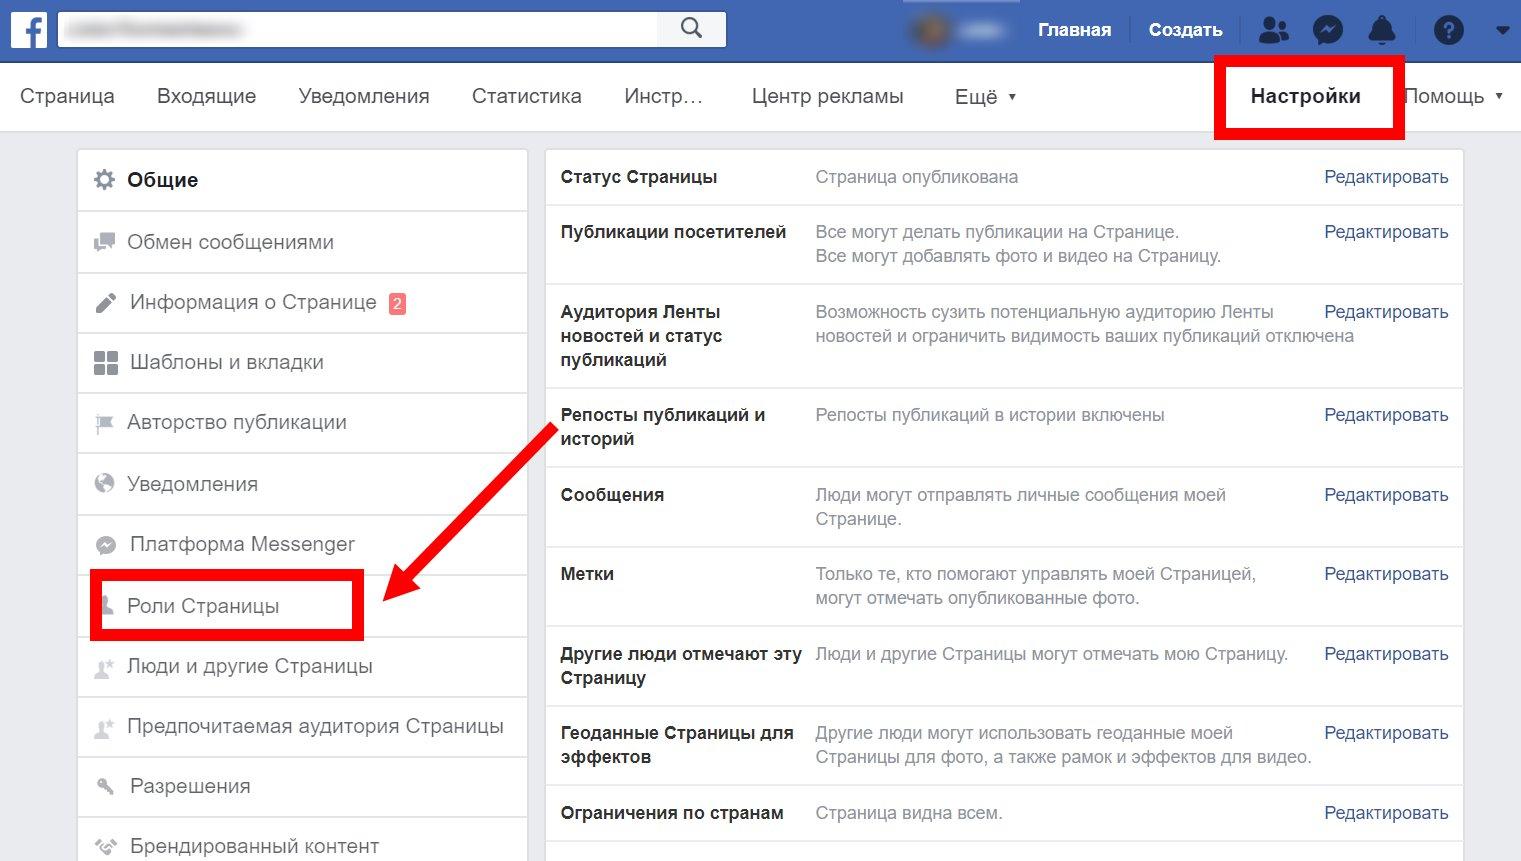 FB_kak-dobavit-administratora2.jpg